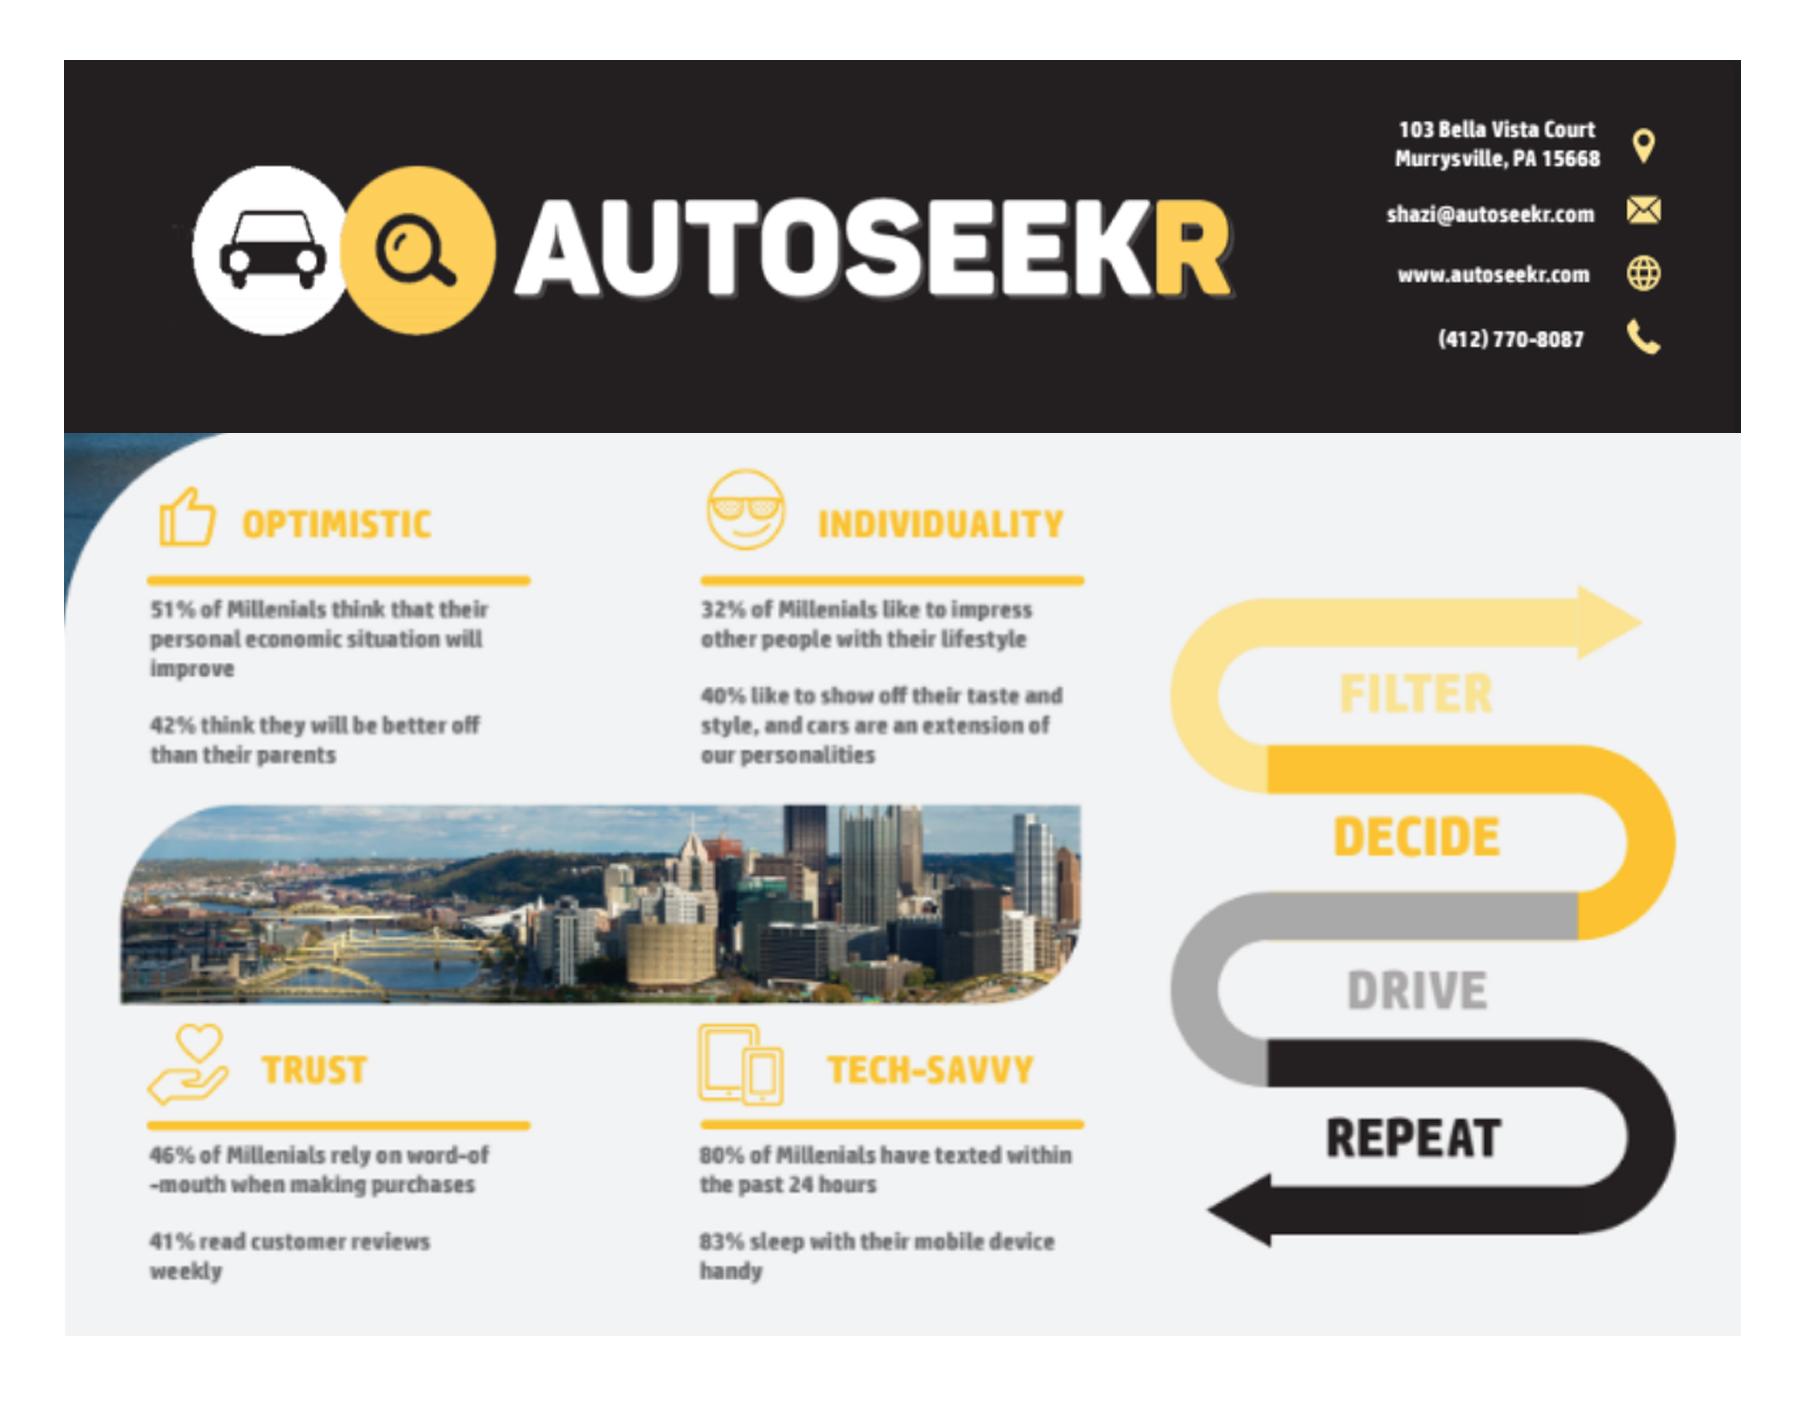 Autoseekr Strategy